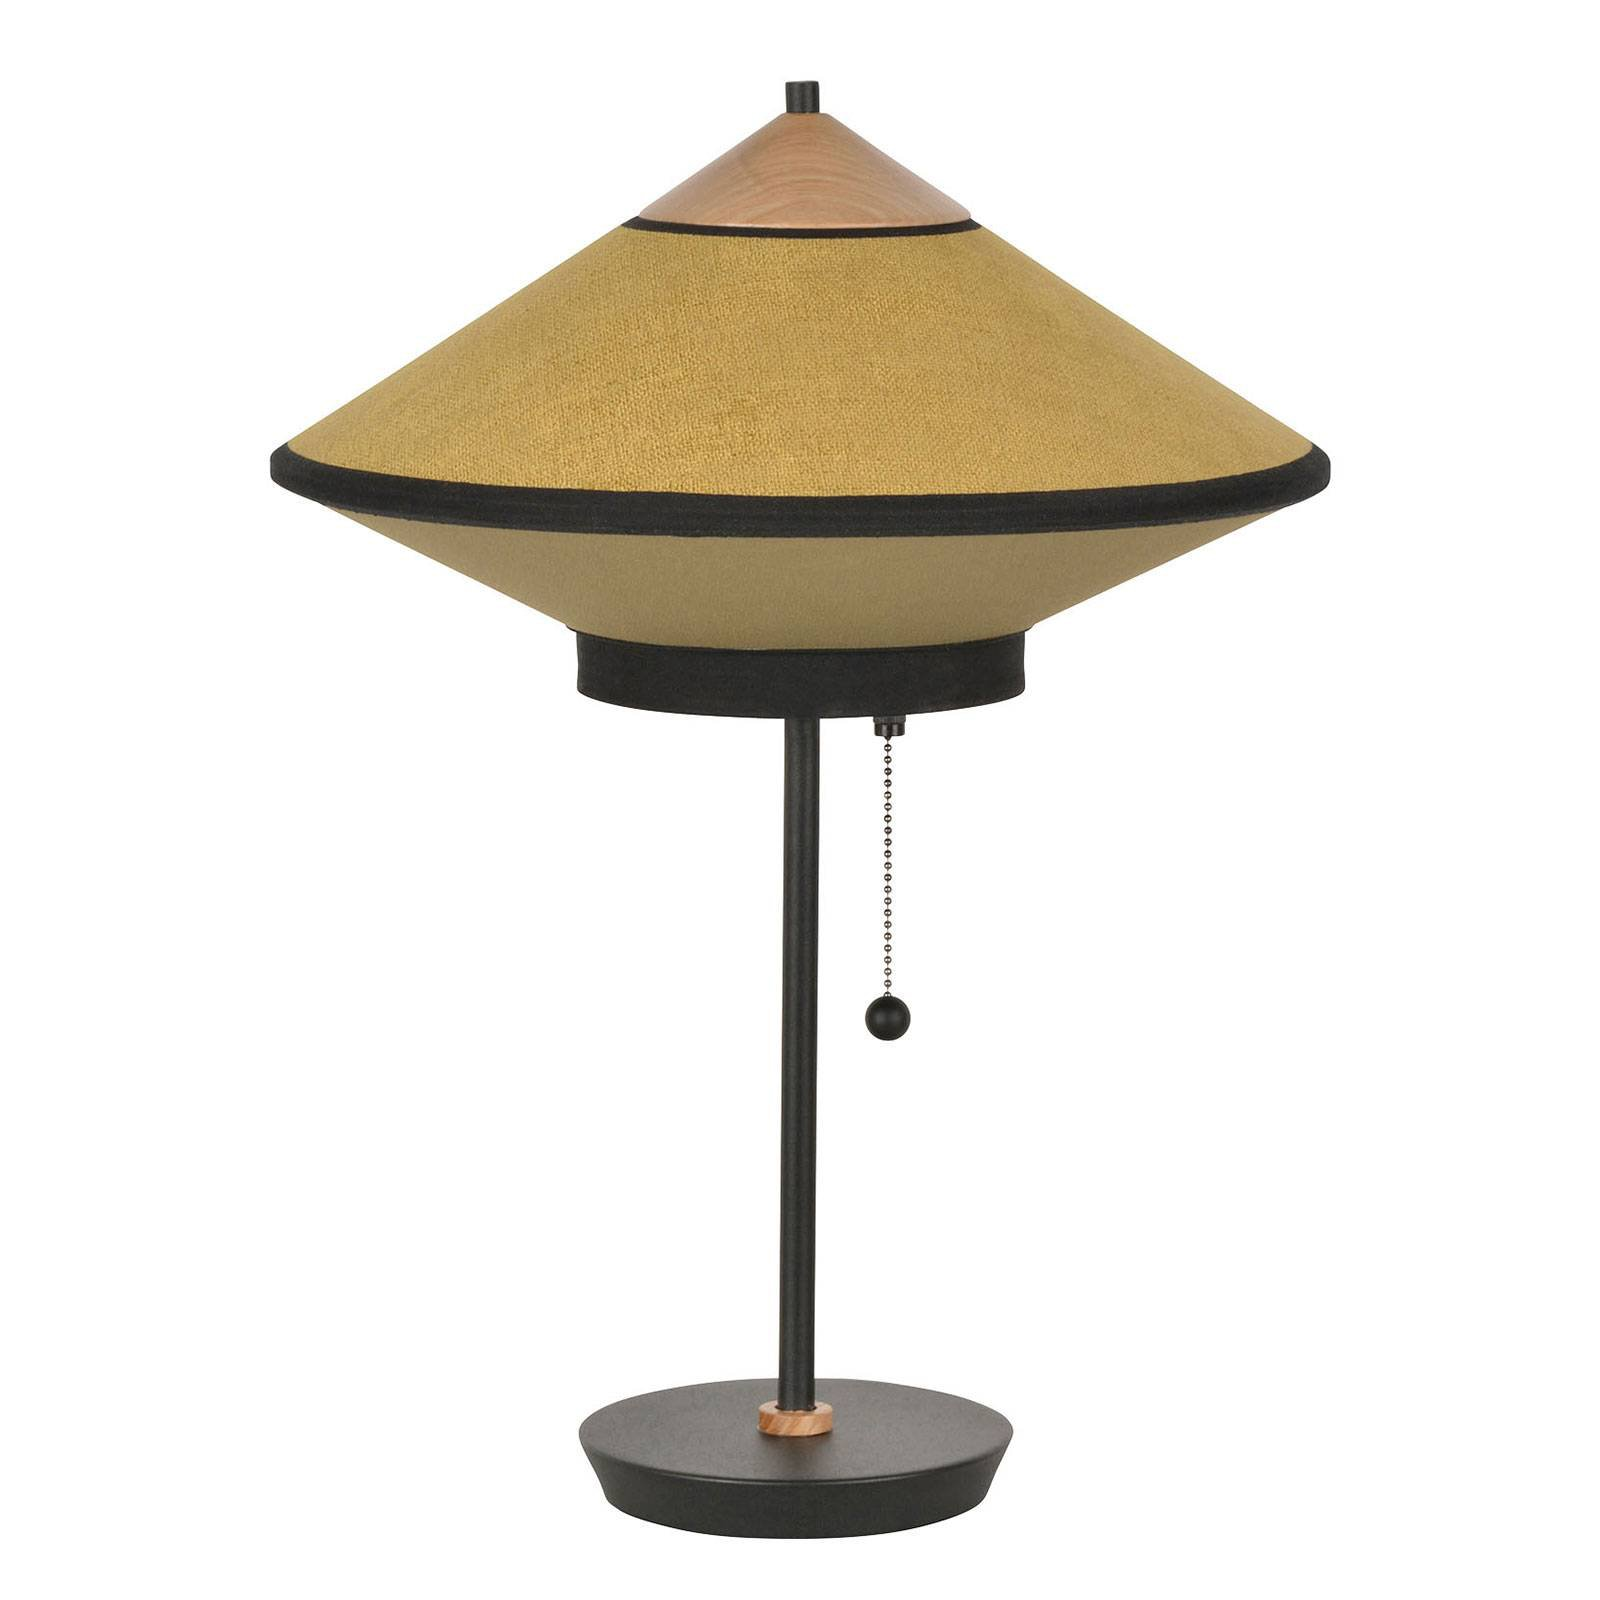 Forestier Cymbal S bordlampe, bronse